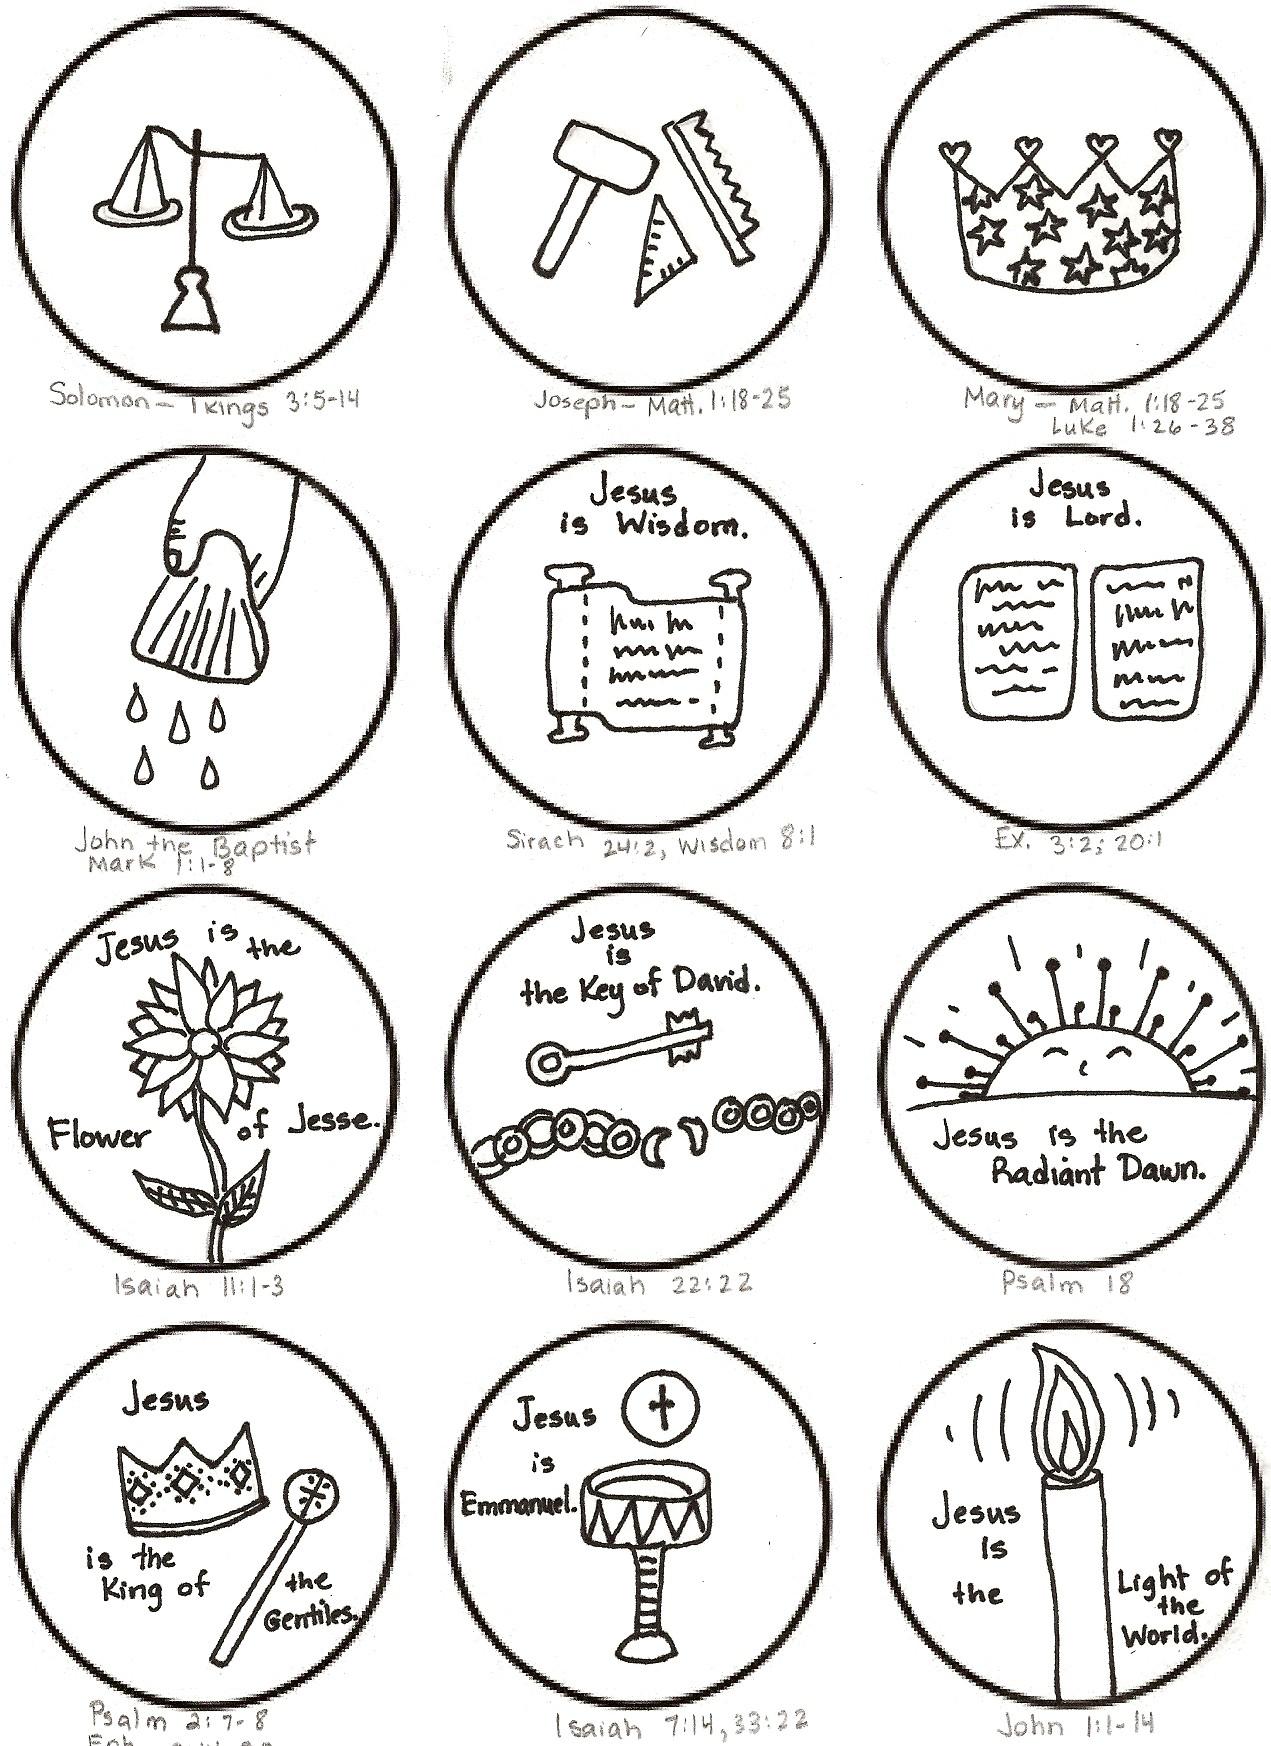 Jesse Tree Printable Symbols | www.galleryhip.com - The Hippest Pics